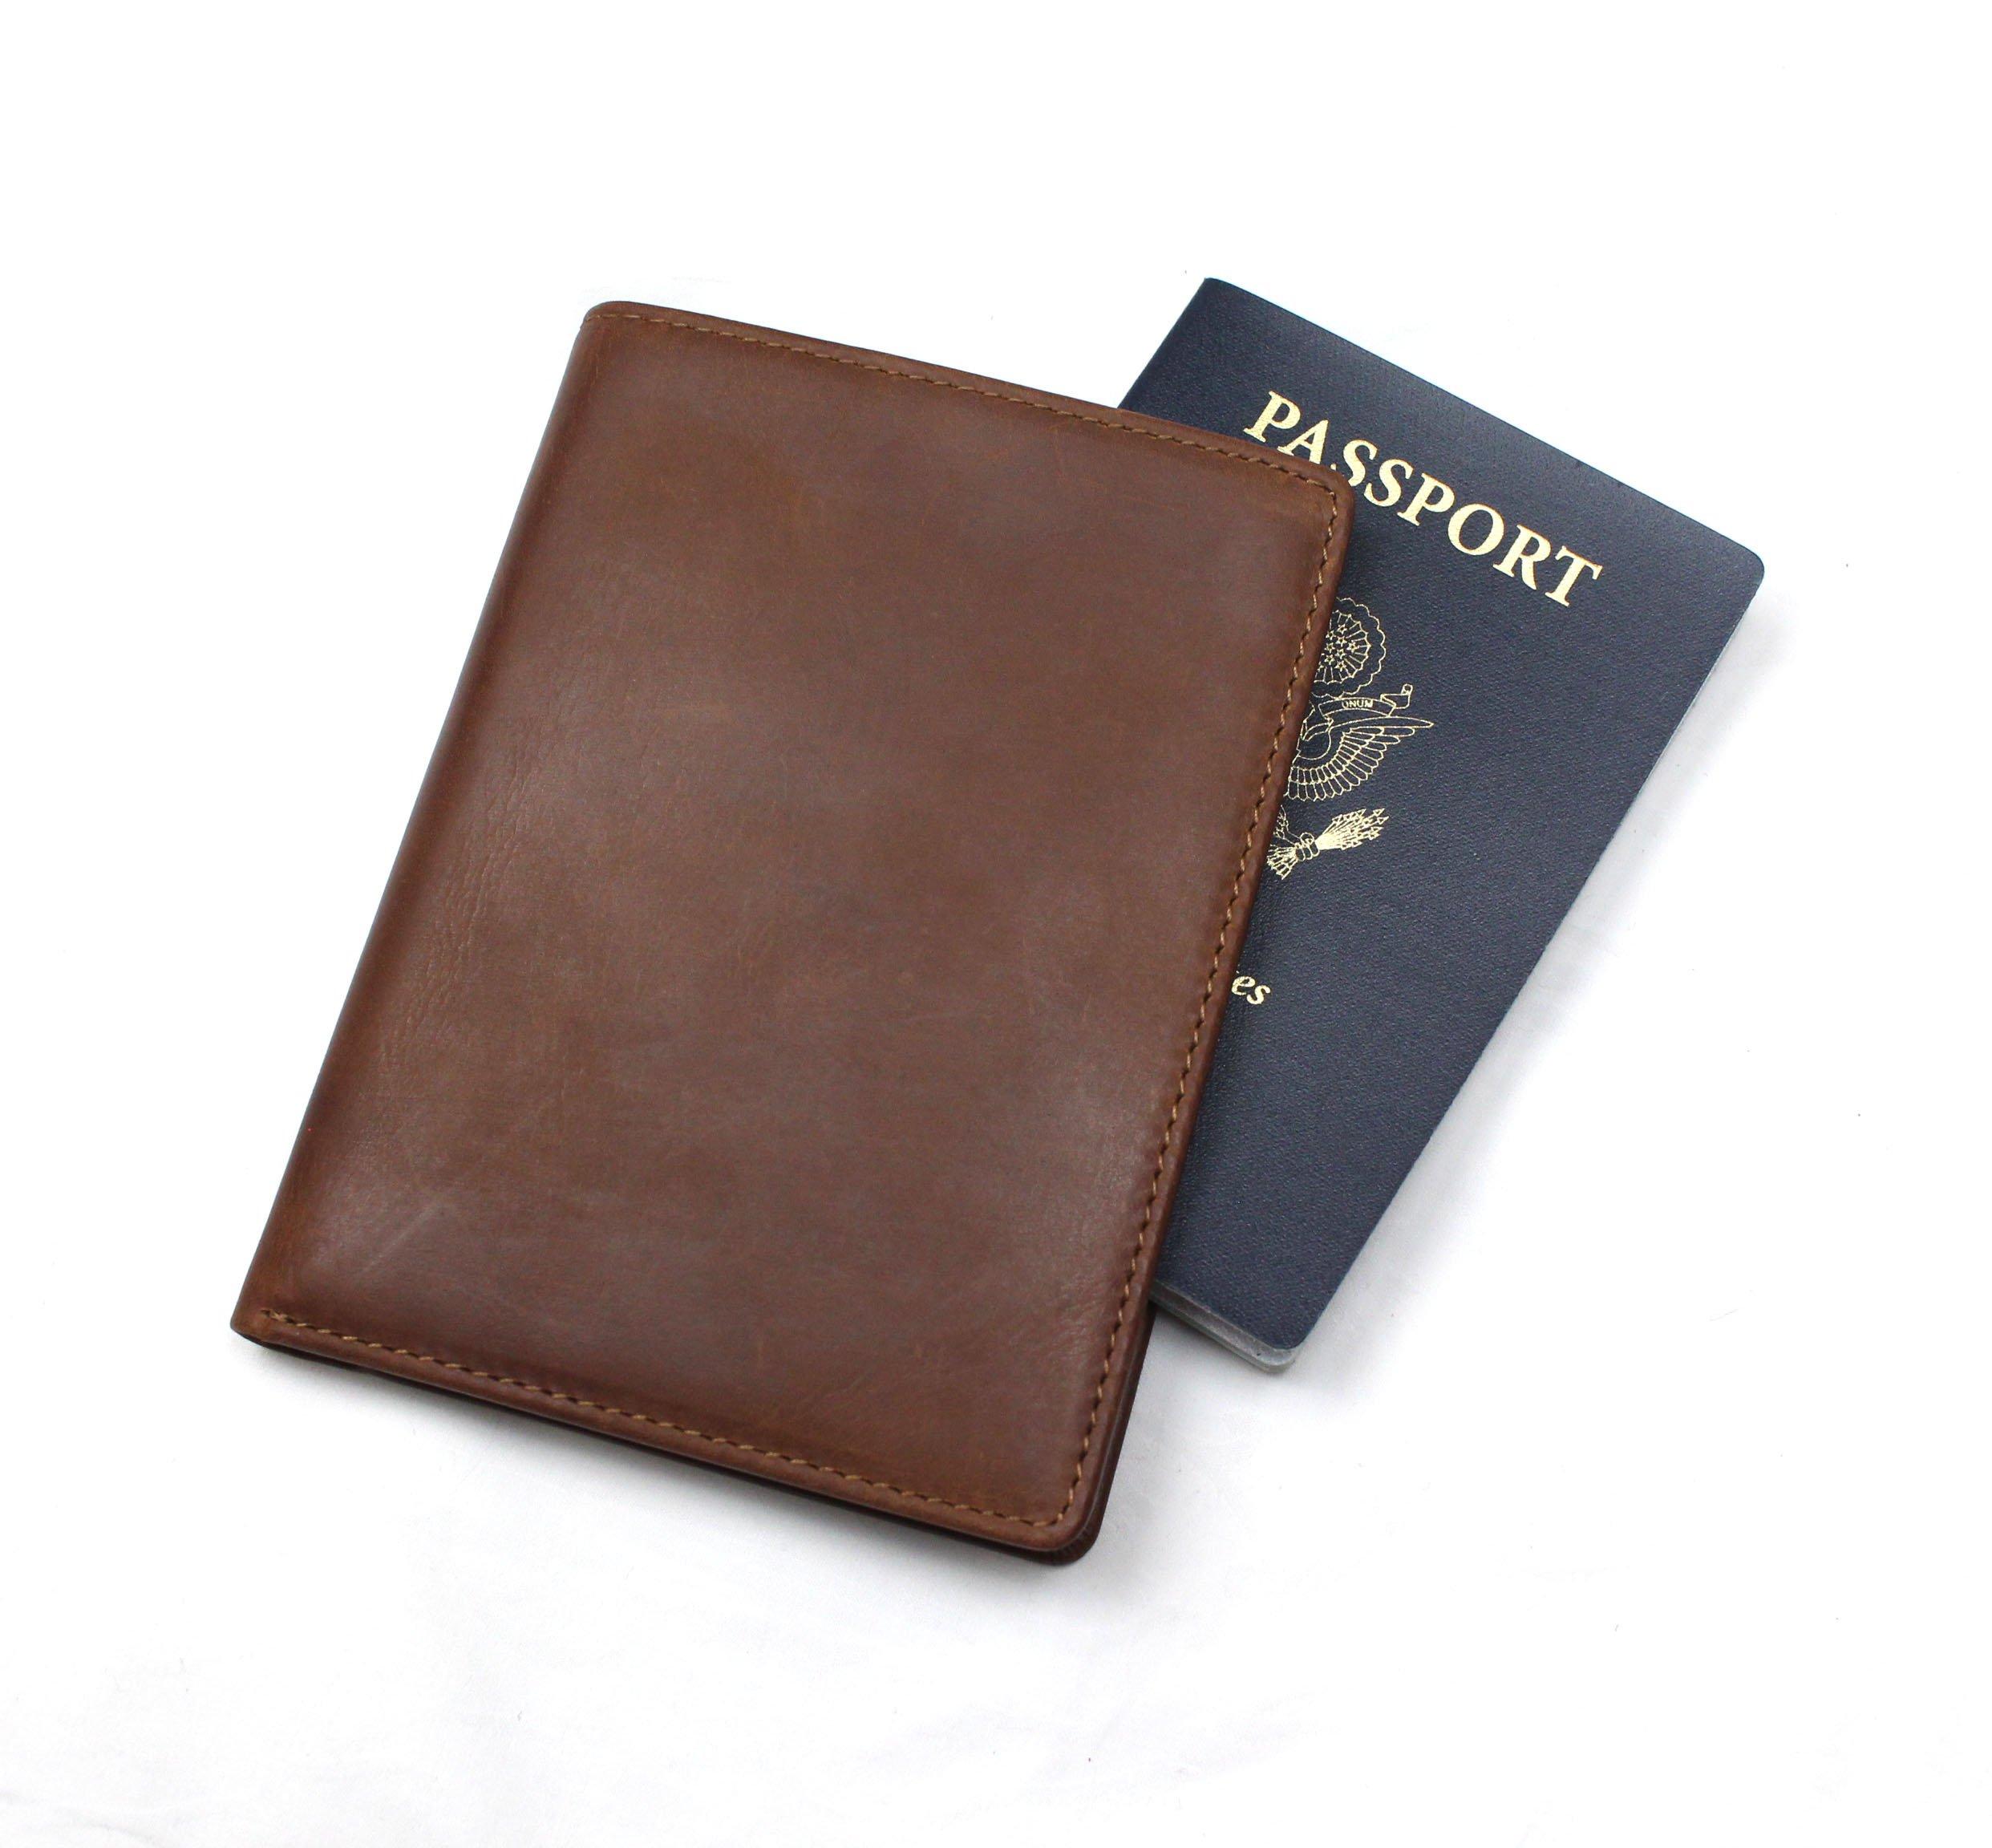 RFID Blocking Passport Holder Travel Wallet - Genuine Crazy Horse Leather by Habitoux (Image #2)